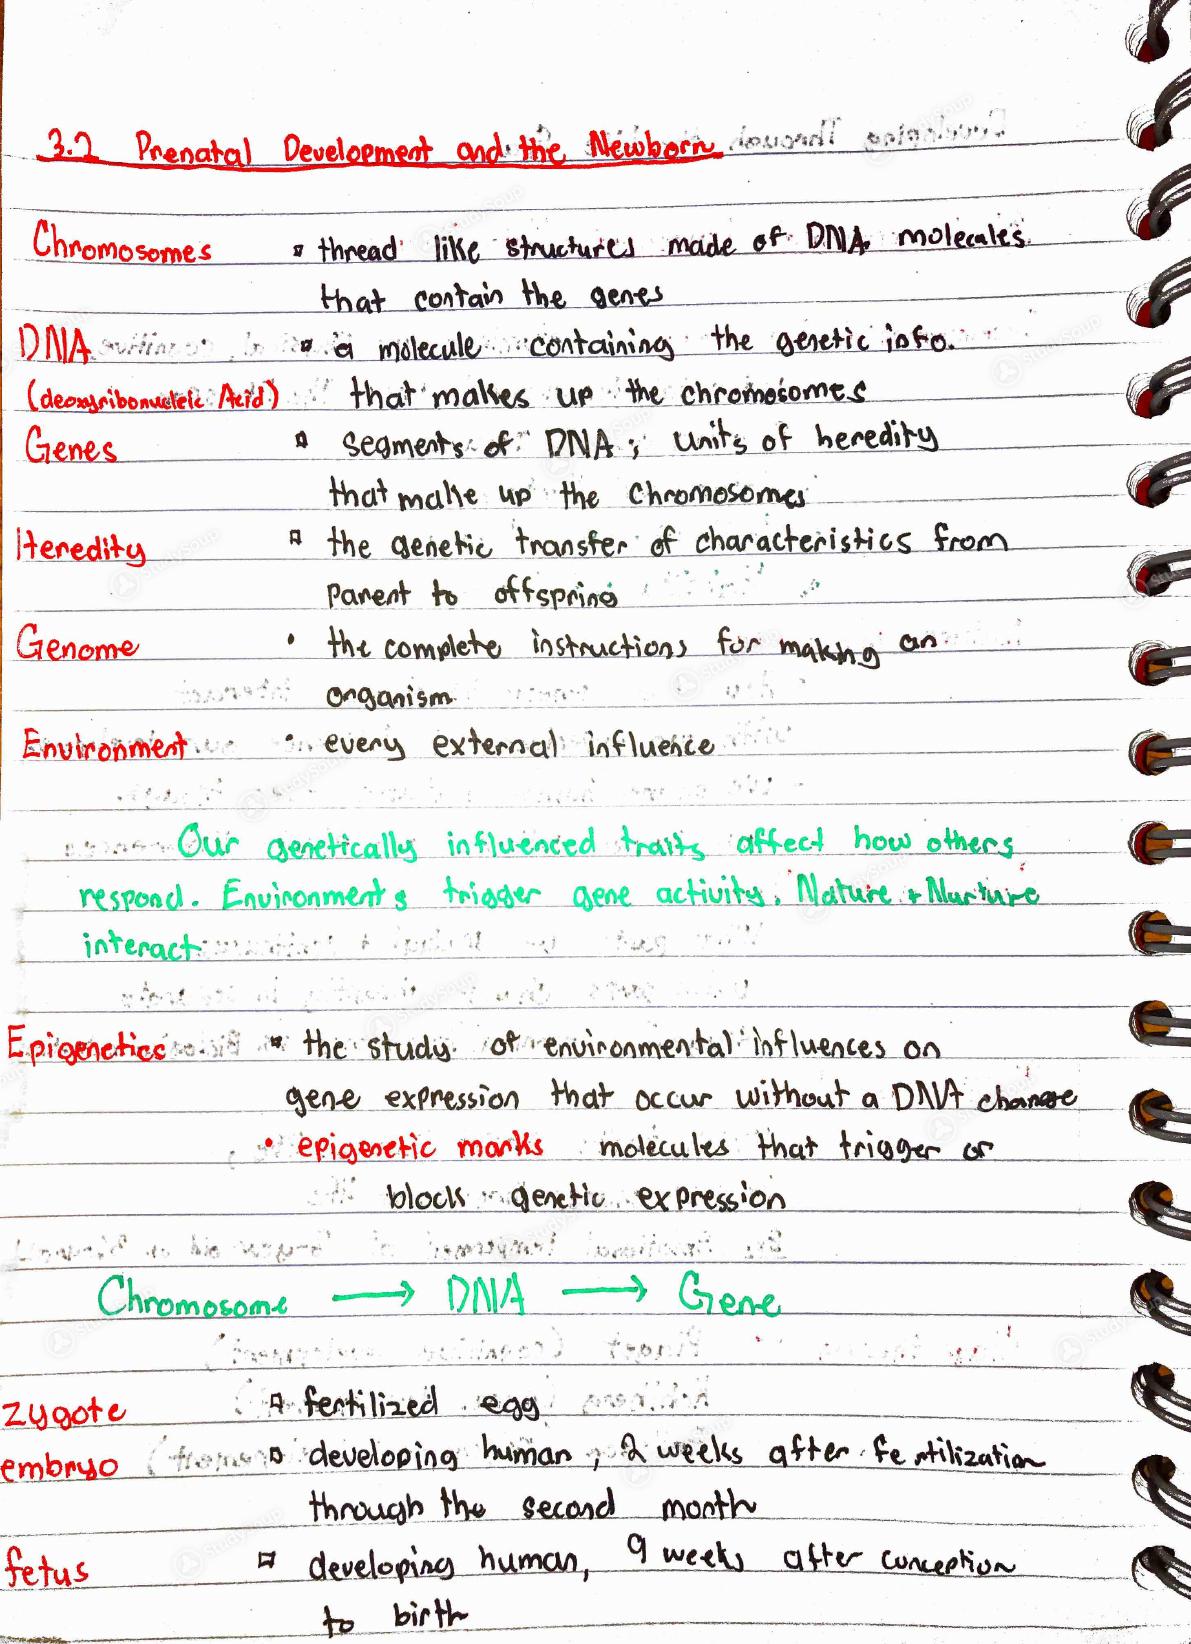 GSU - psychology 1101 - Intro to Psychology Chapter 3 Notes - Class